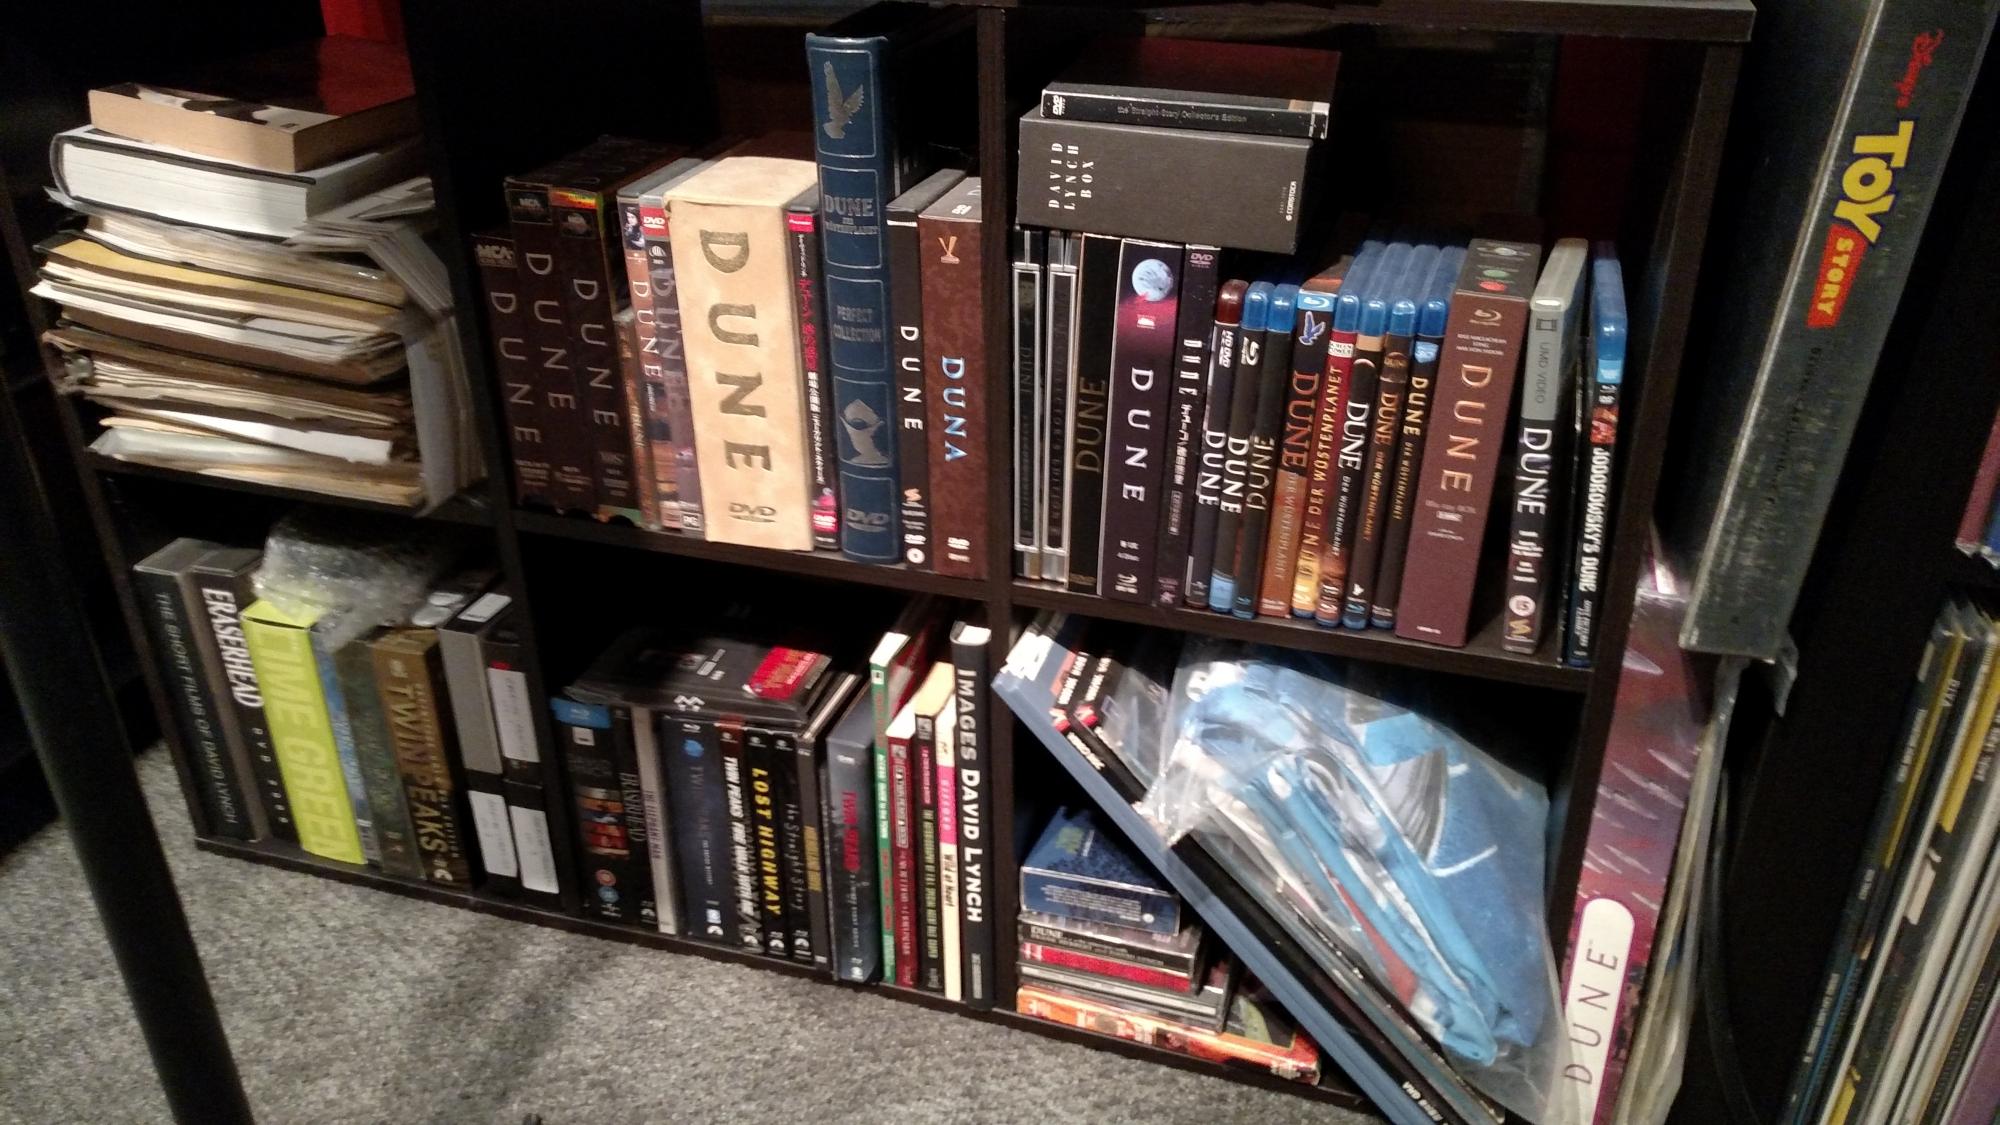 David Lynch Video Shelf